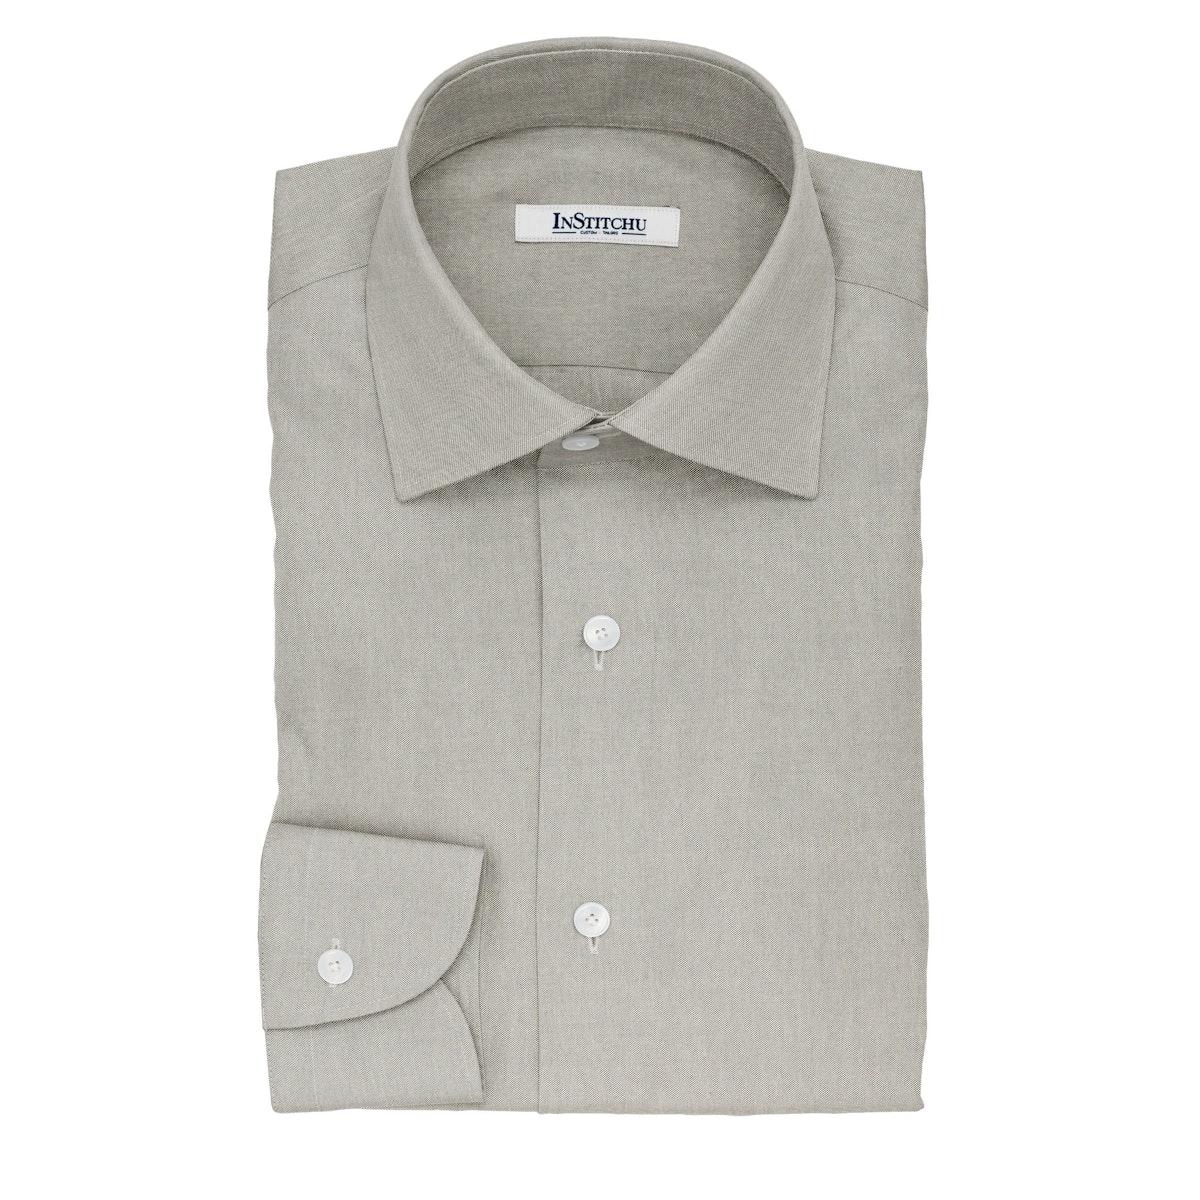 InStitchu Collection The Whitman Grey Cotton Shirt